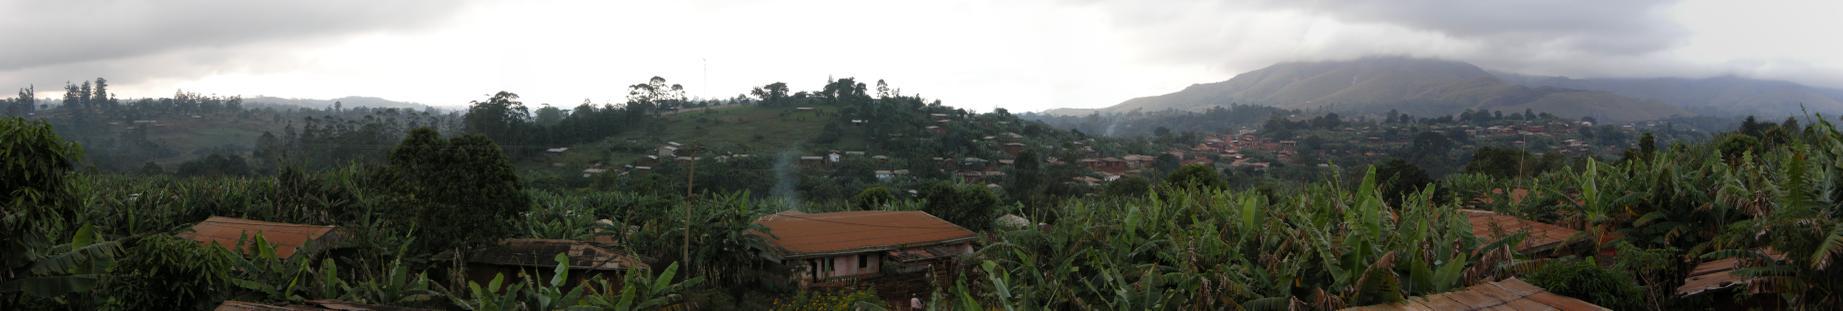 http://cameroon.betacantrips.com/wp-content/uploads/2010/11/balcony-scale0.25.jpg